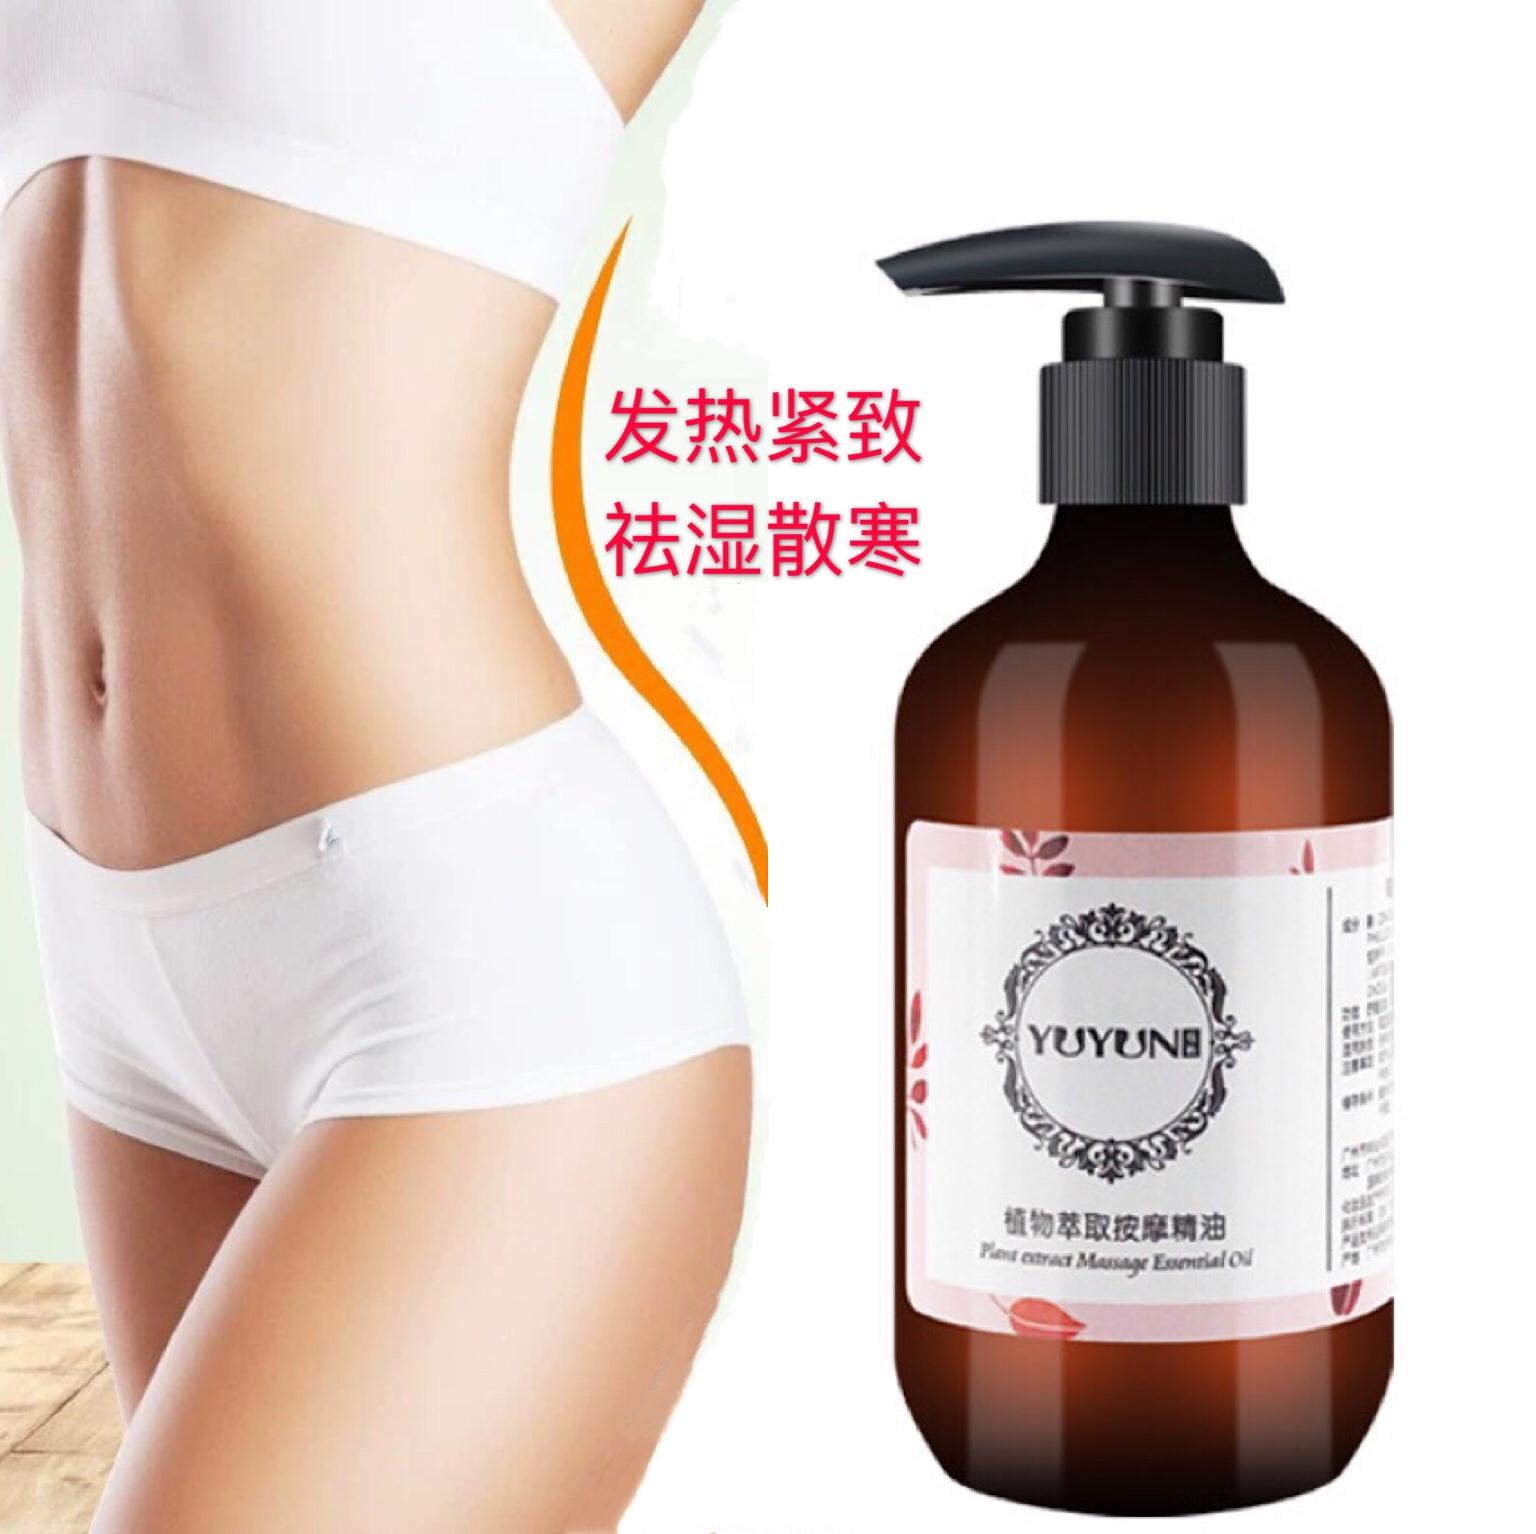 The beauty of the 髮 is hot 緻 massage skin care 300ML